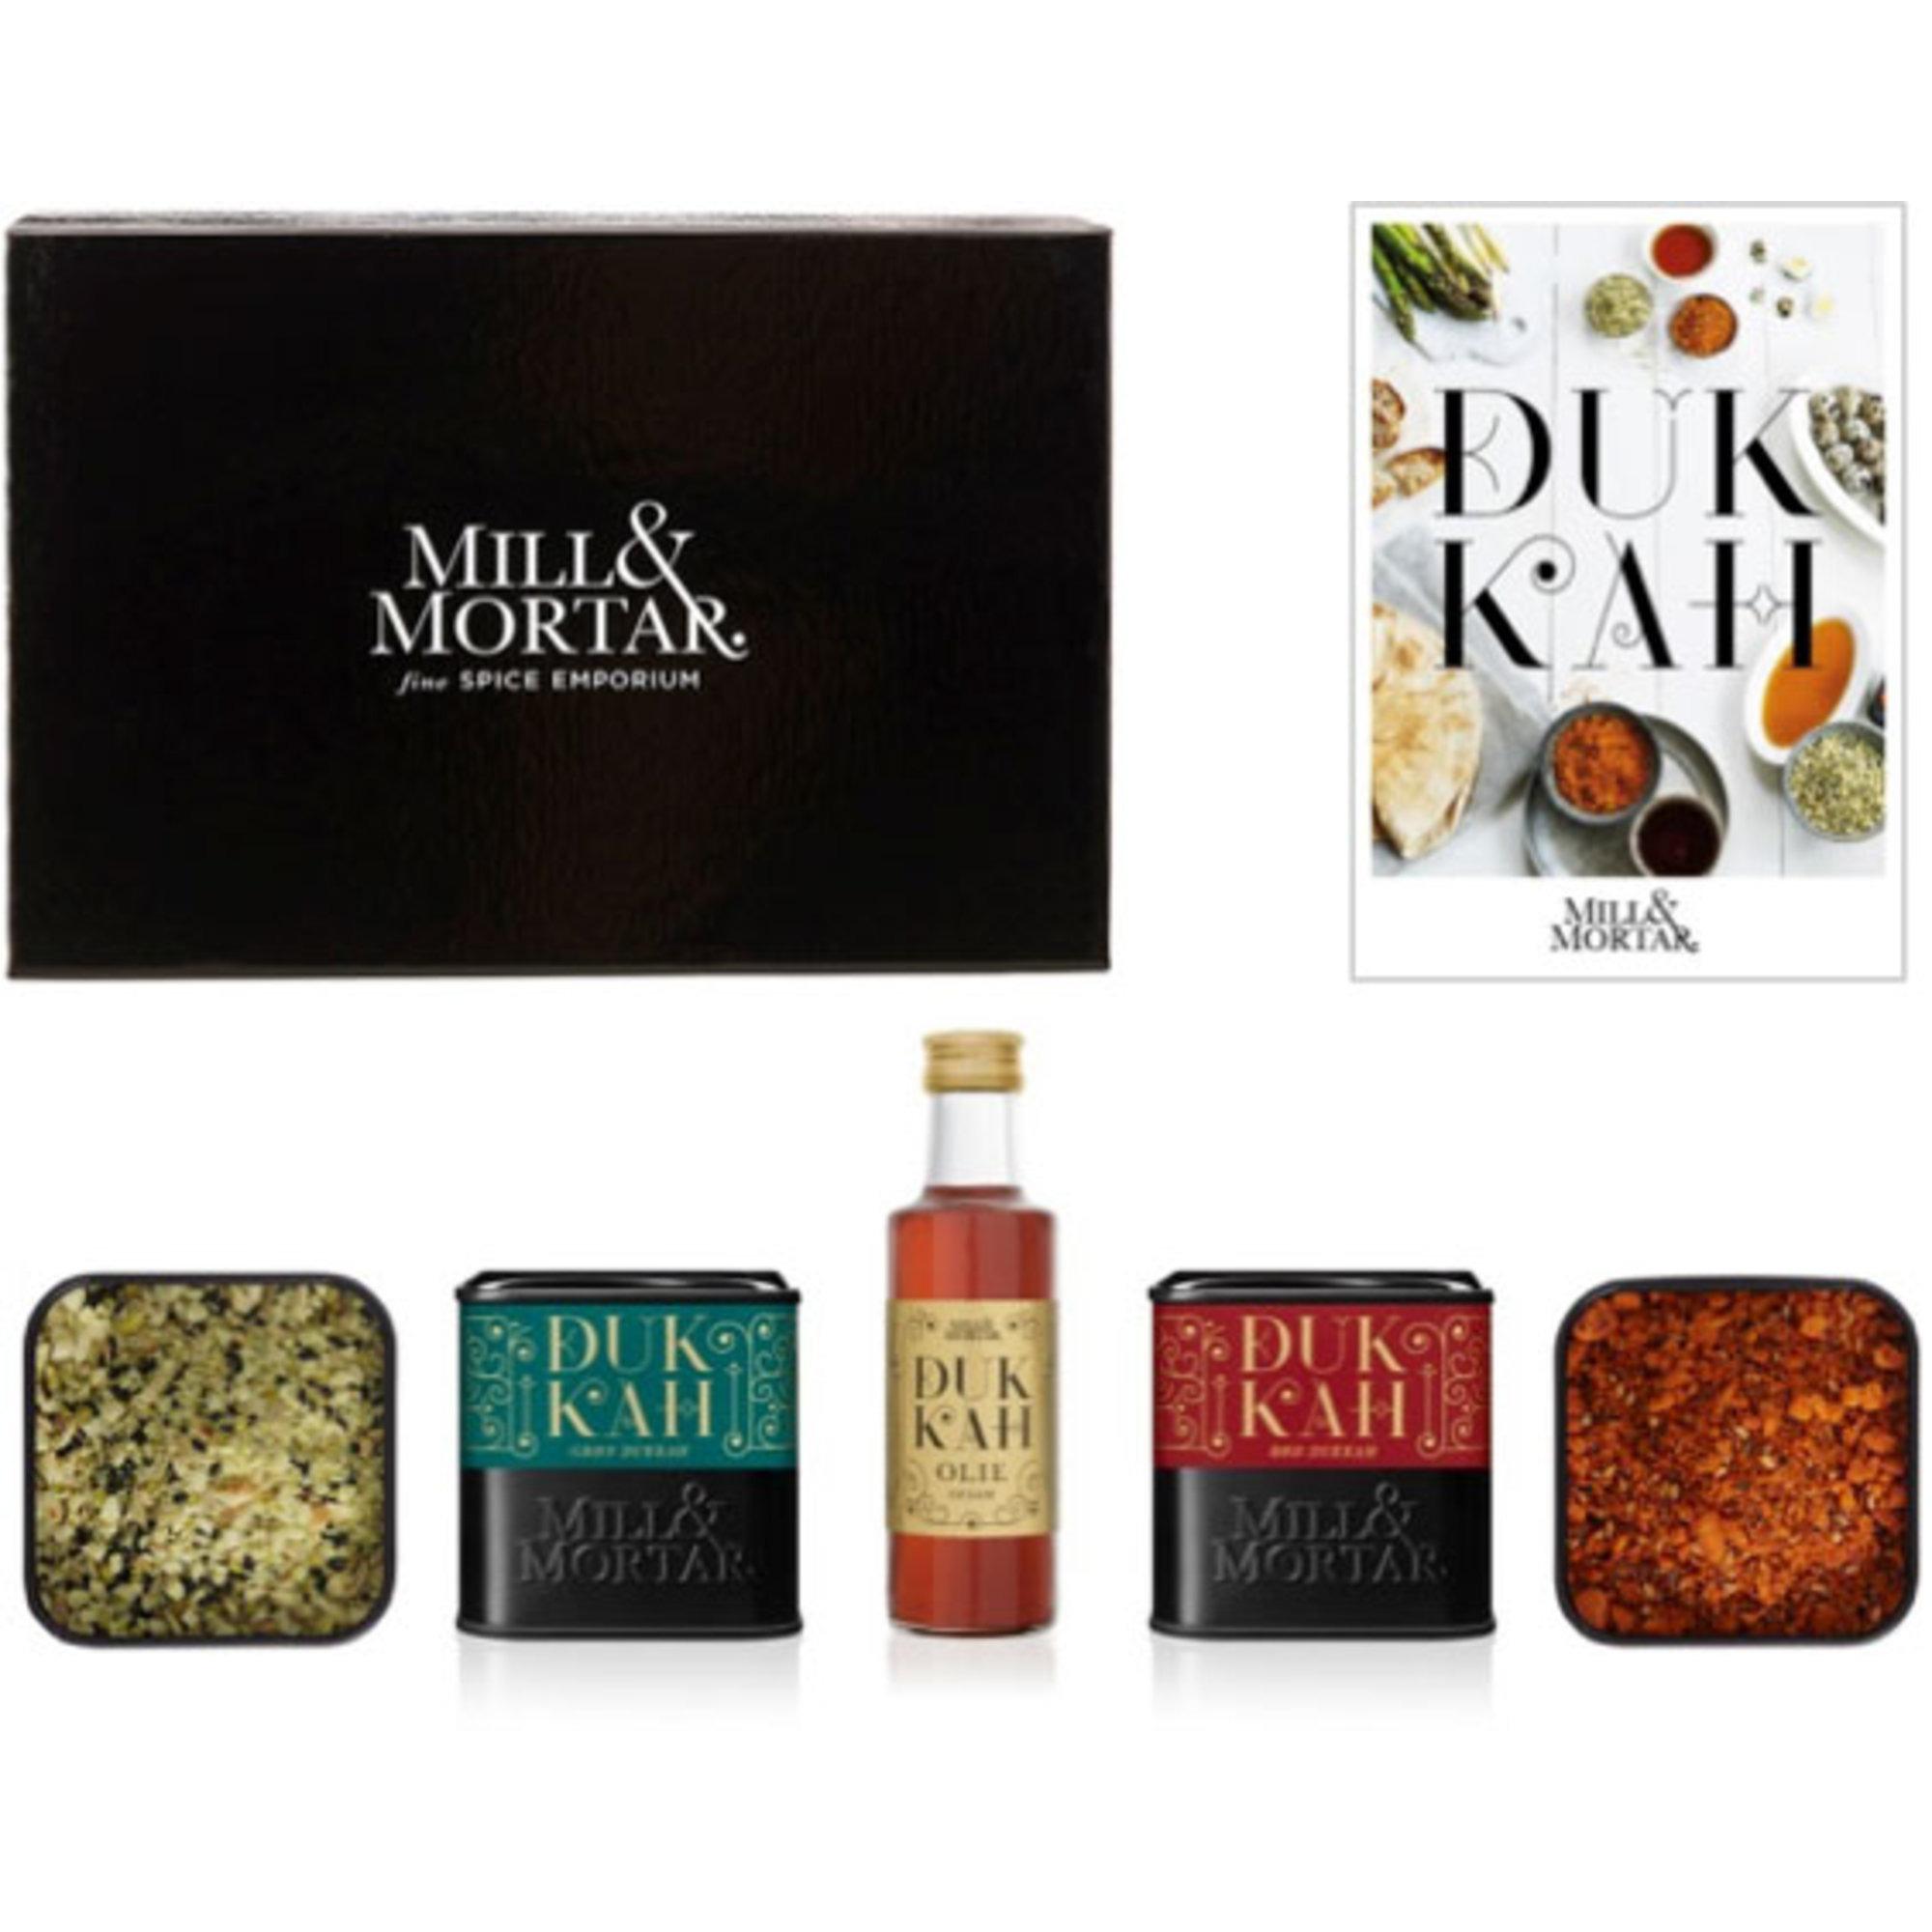 Mill & Mortar Dukkah Kit